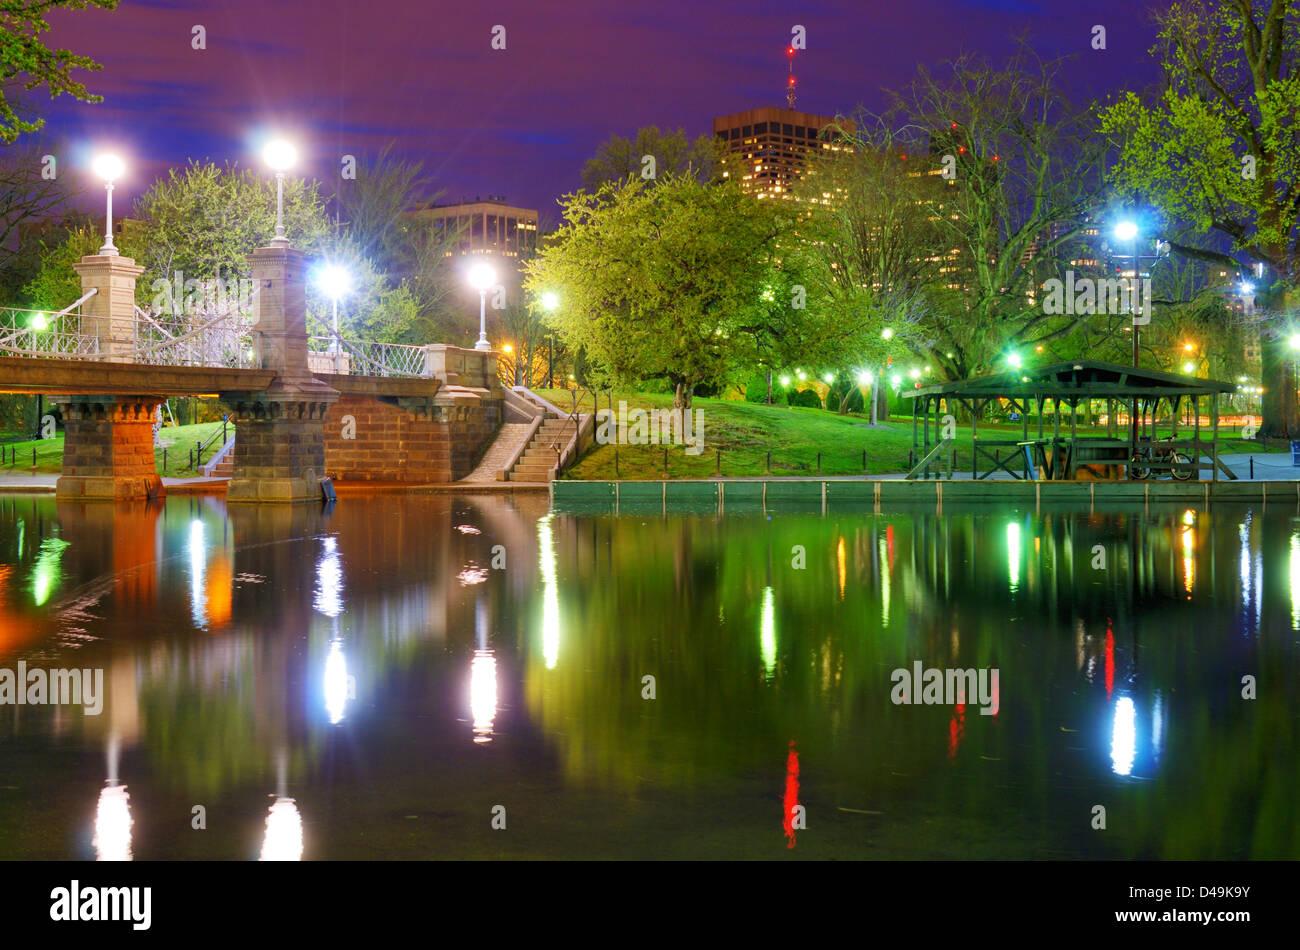 Lagoon Bridge at the Boston Public Gardens in Boston, Massachusetts. - Stock Image